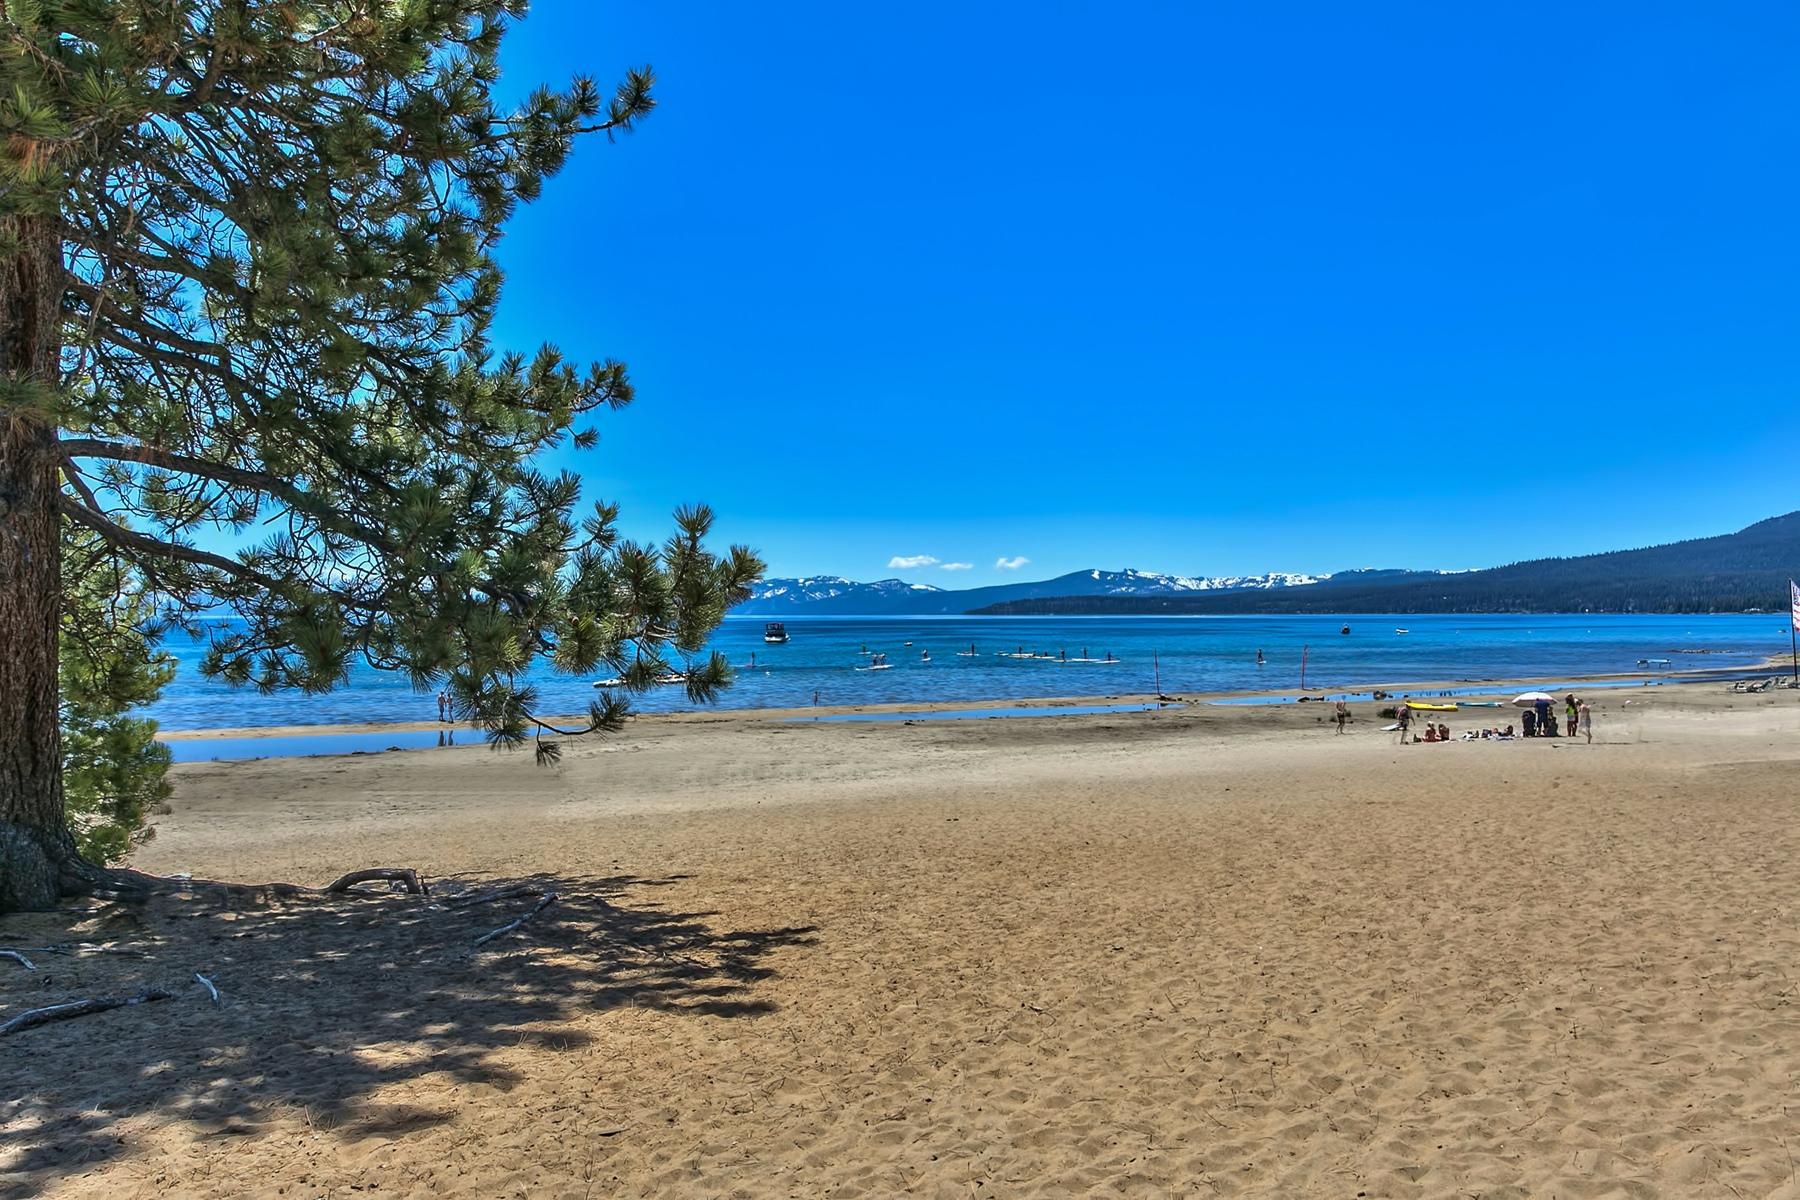 Additional photo for property listing at 8308 North Lake Boulevard, Unit 10 8308 North Lake Boulevard Unit 10 Kings Beach, California 96143 Estados Unidos